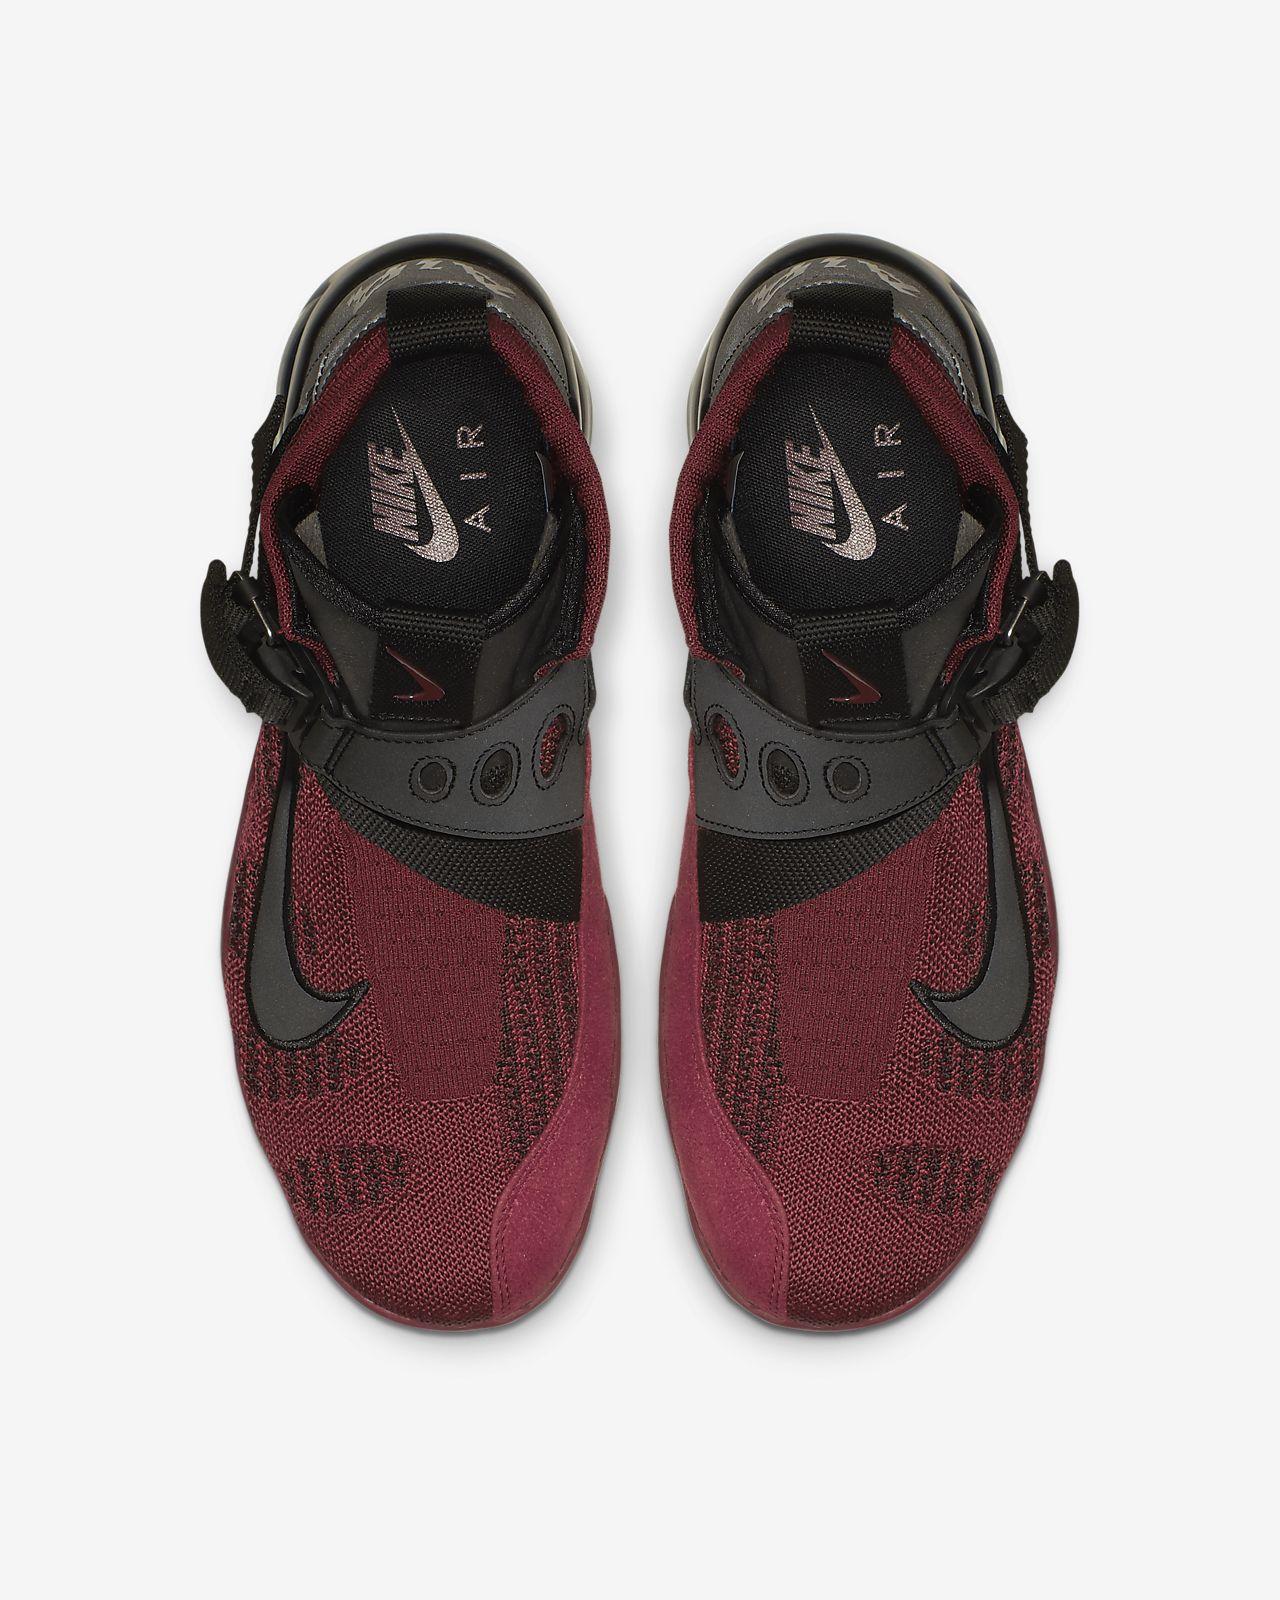 53c5a0e720e3 Nike Air VaporMax Premier Flyknit Men s Shoe. Nike.com